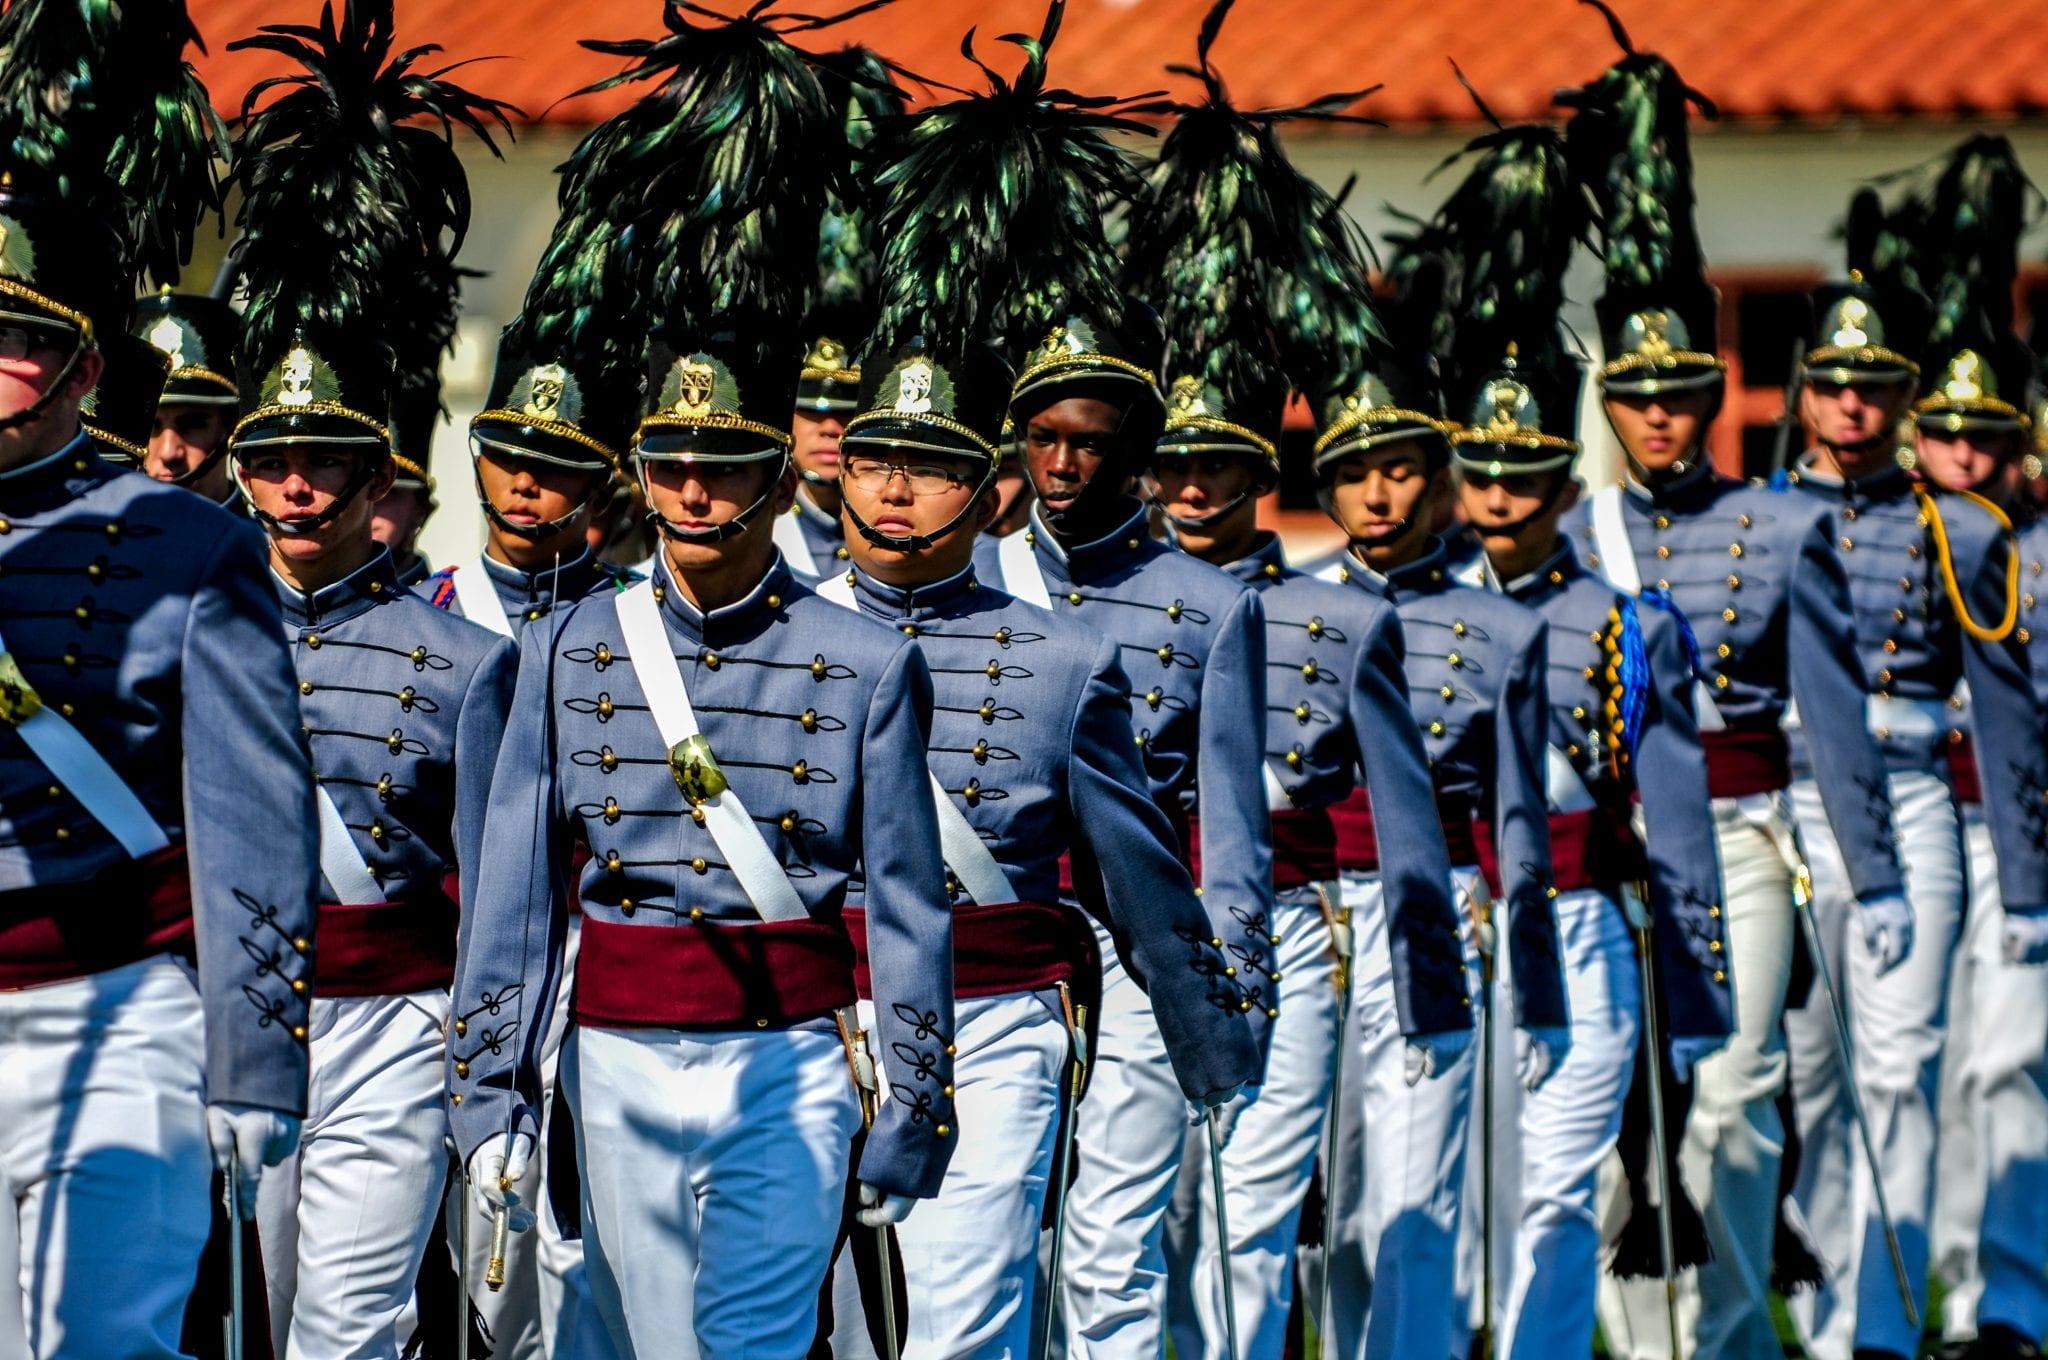 ANA Military Parade